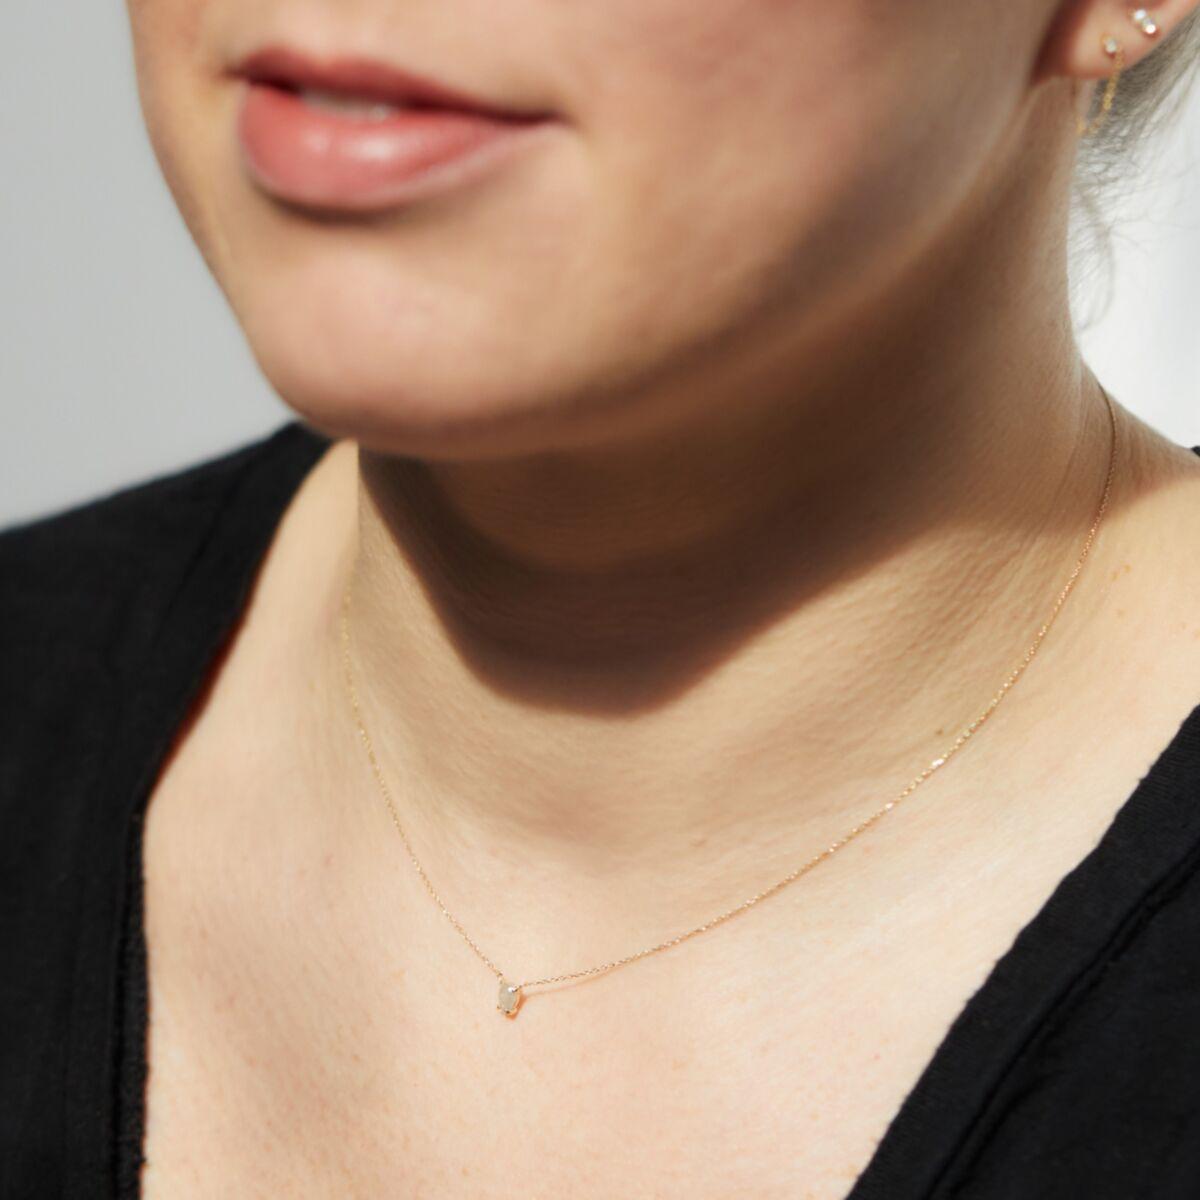 Icy Gray Diamond Necklace image